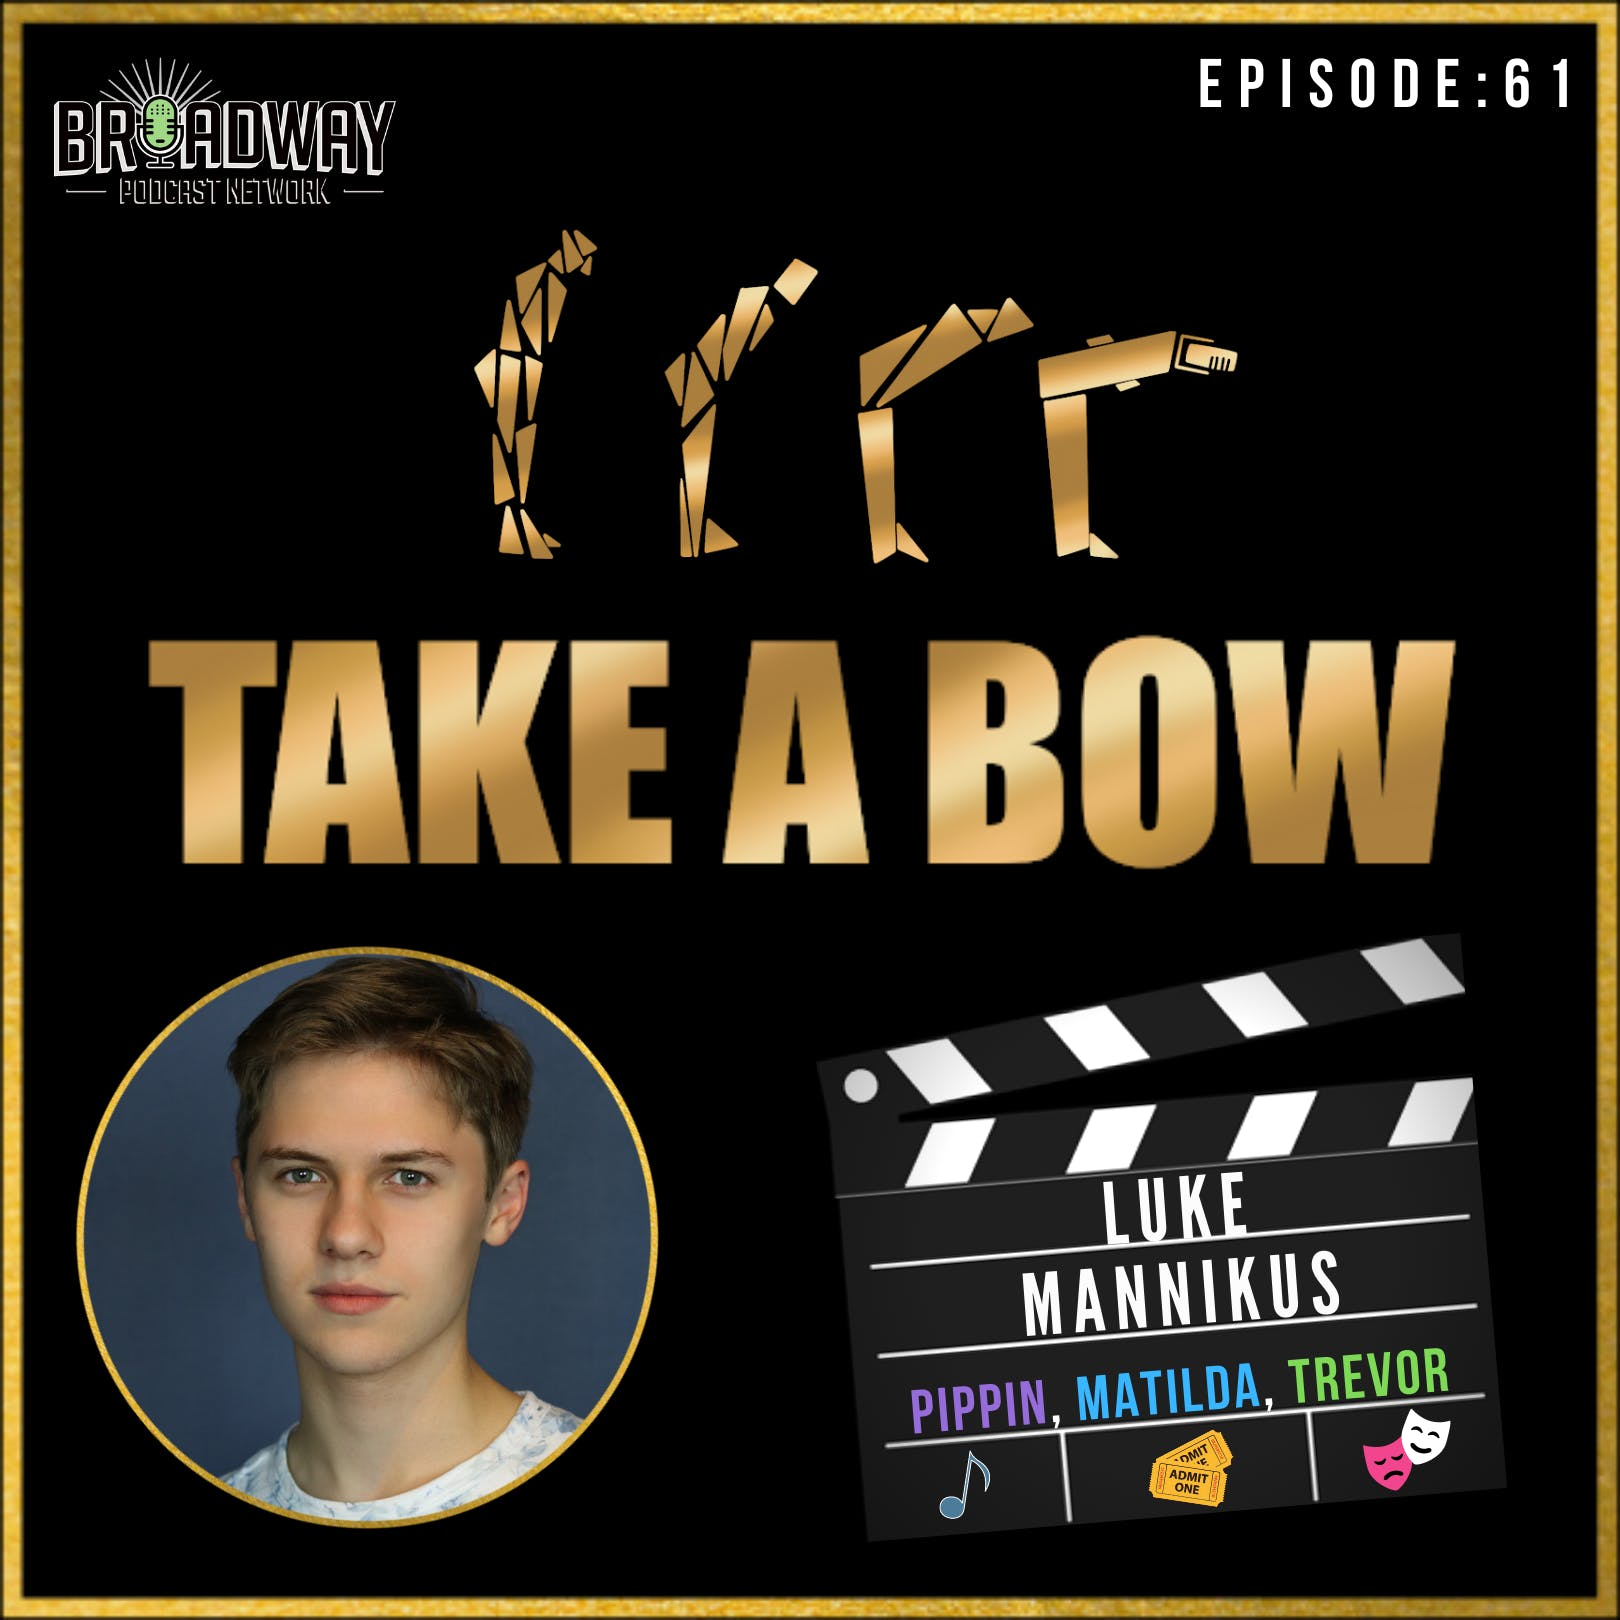 #61 - Luke Mannikus has Magic To Do